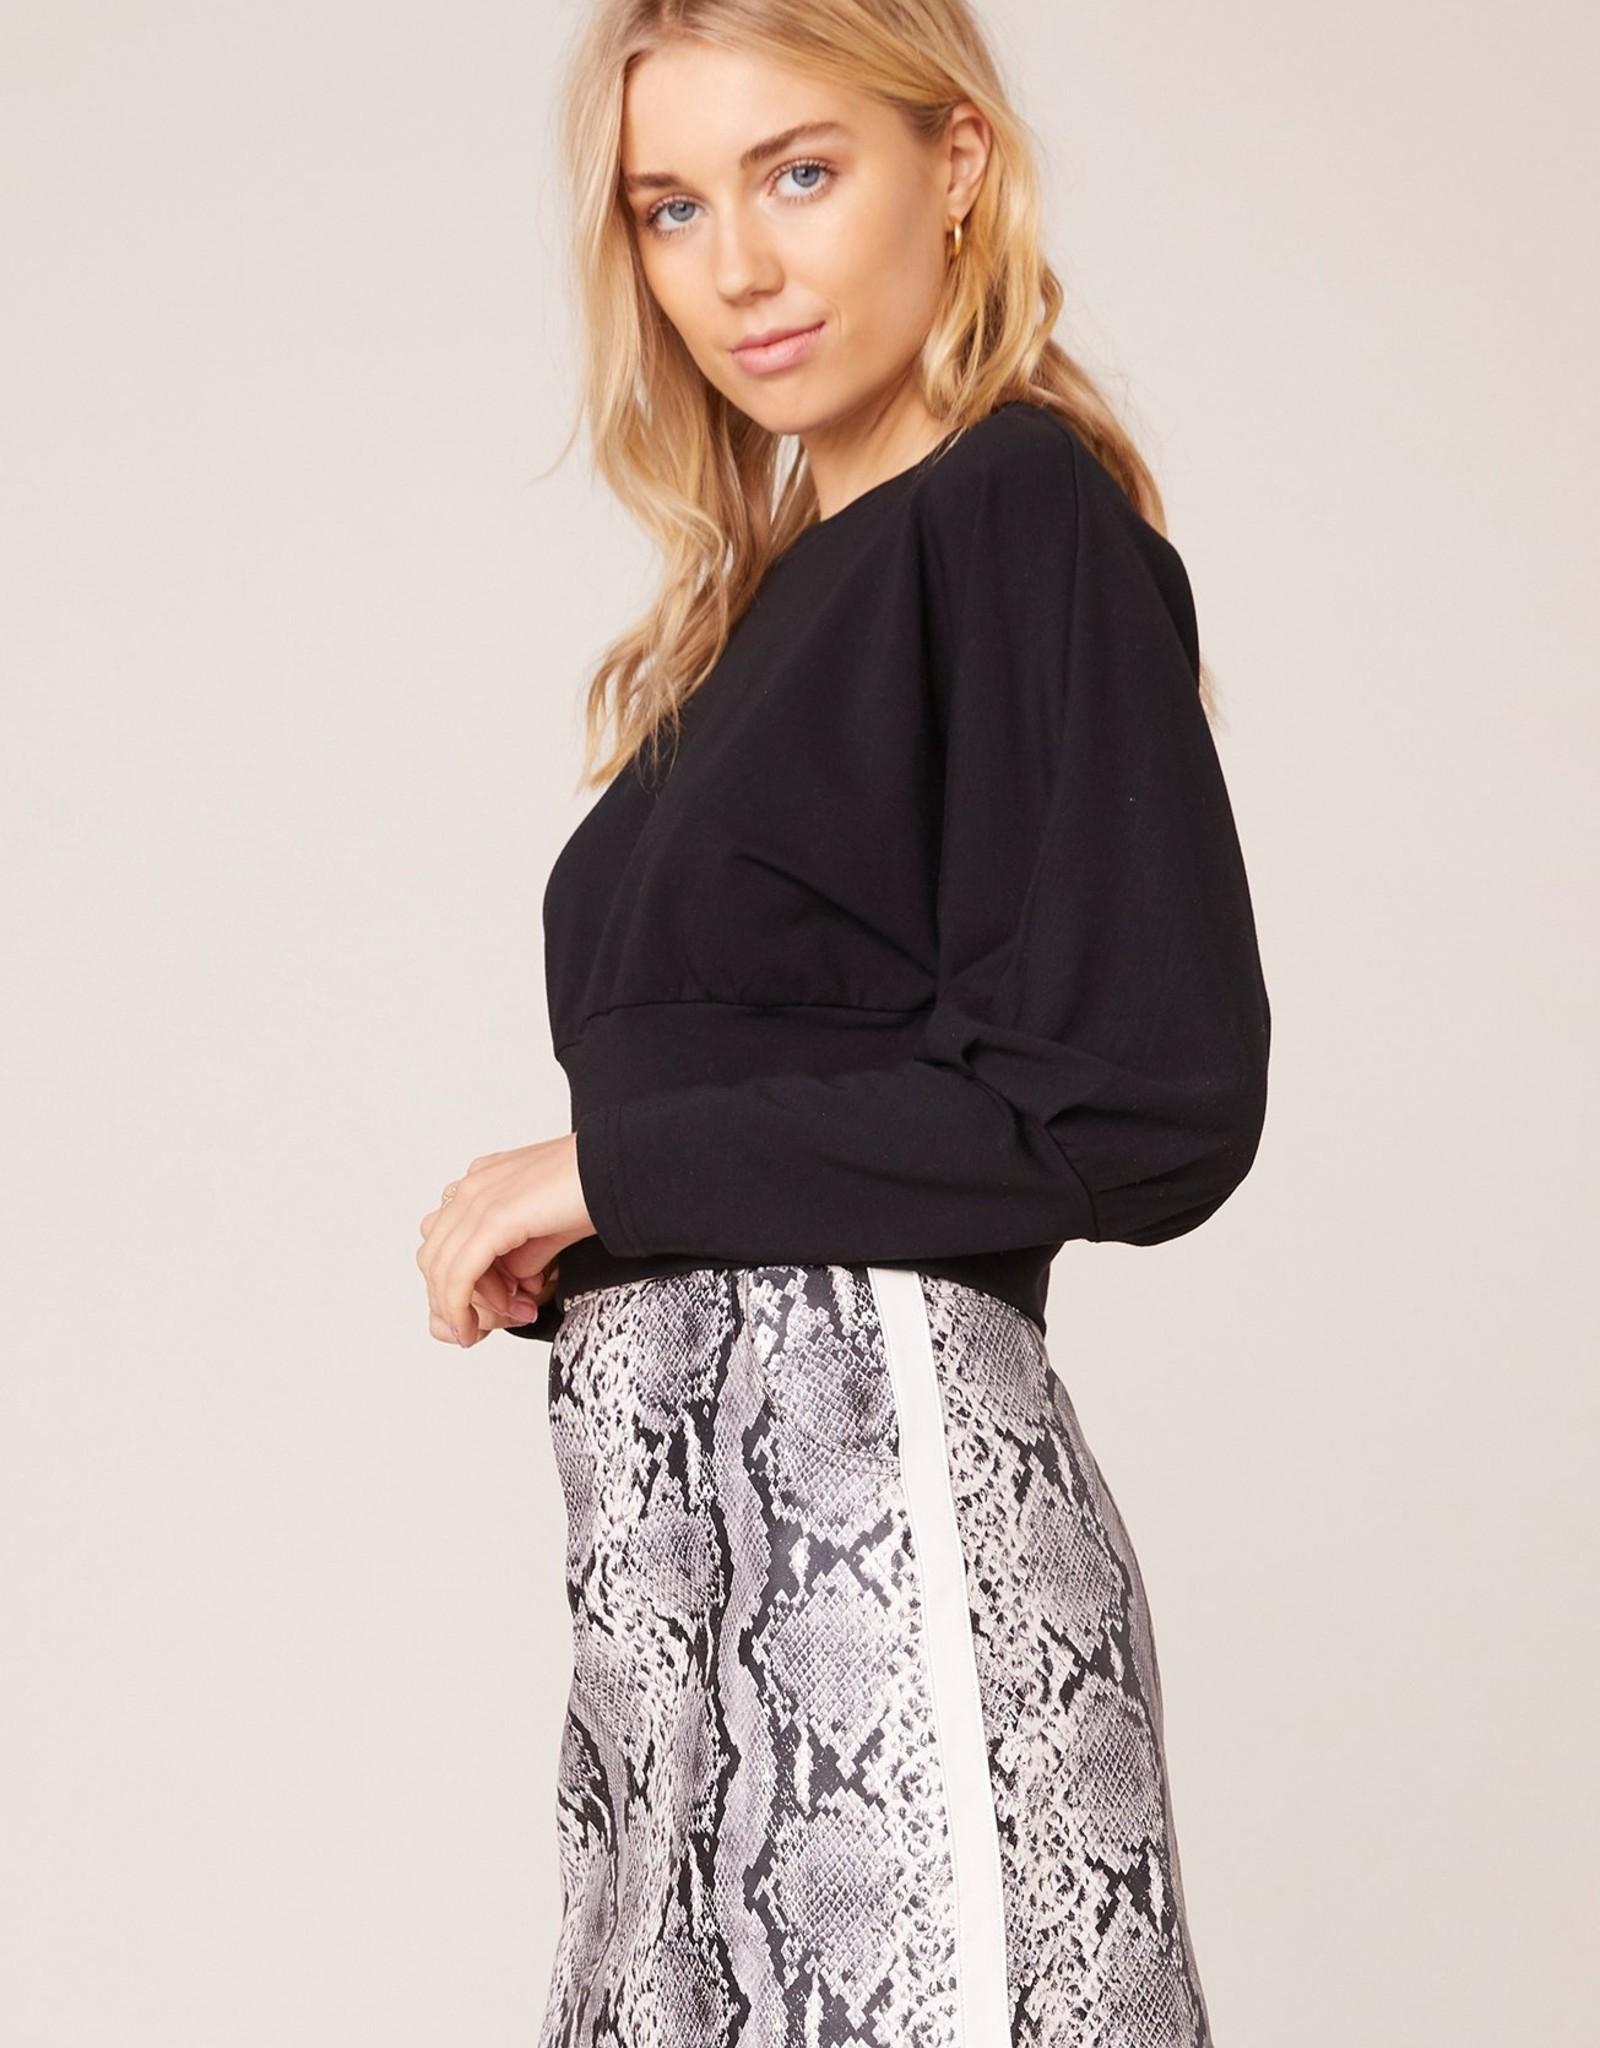 BB Dakota Python The Prowl Vegan Leather Skirt